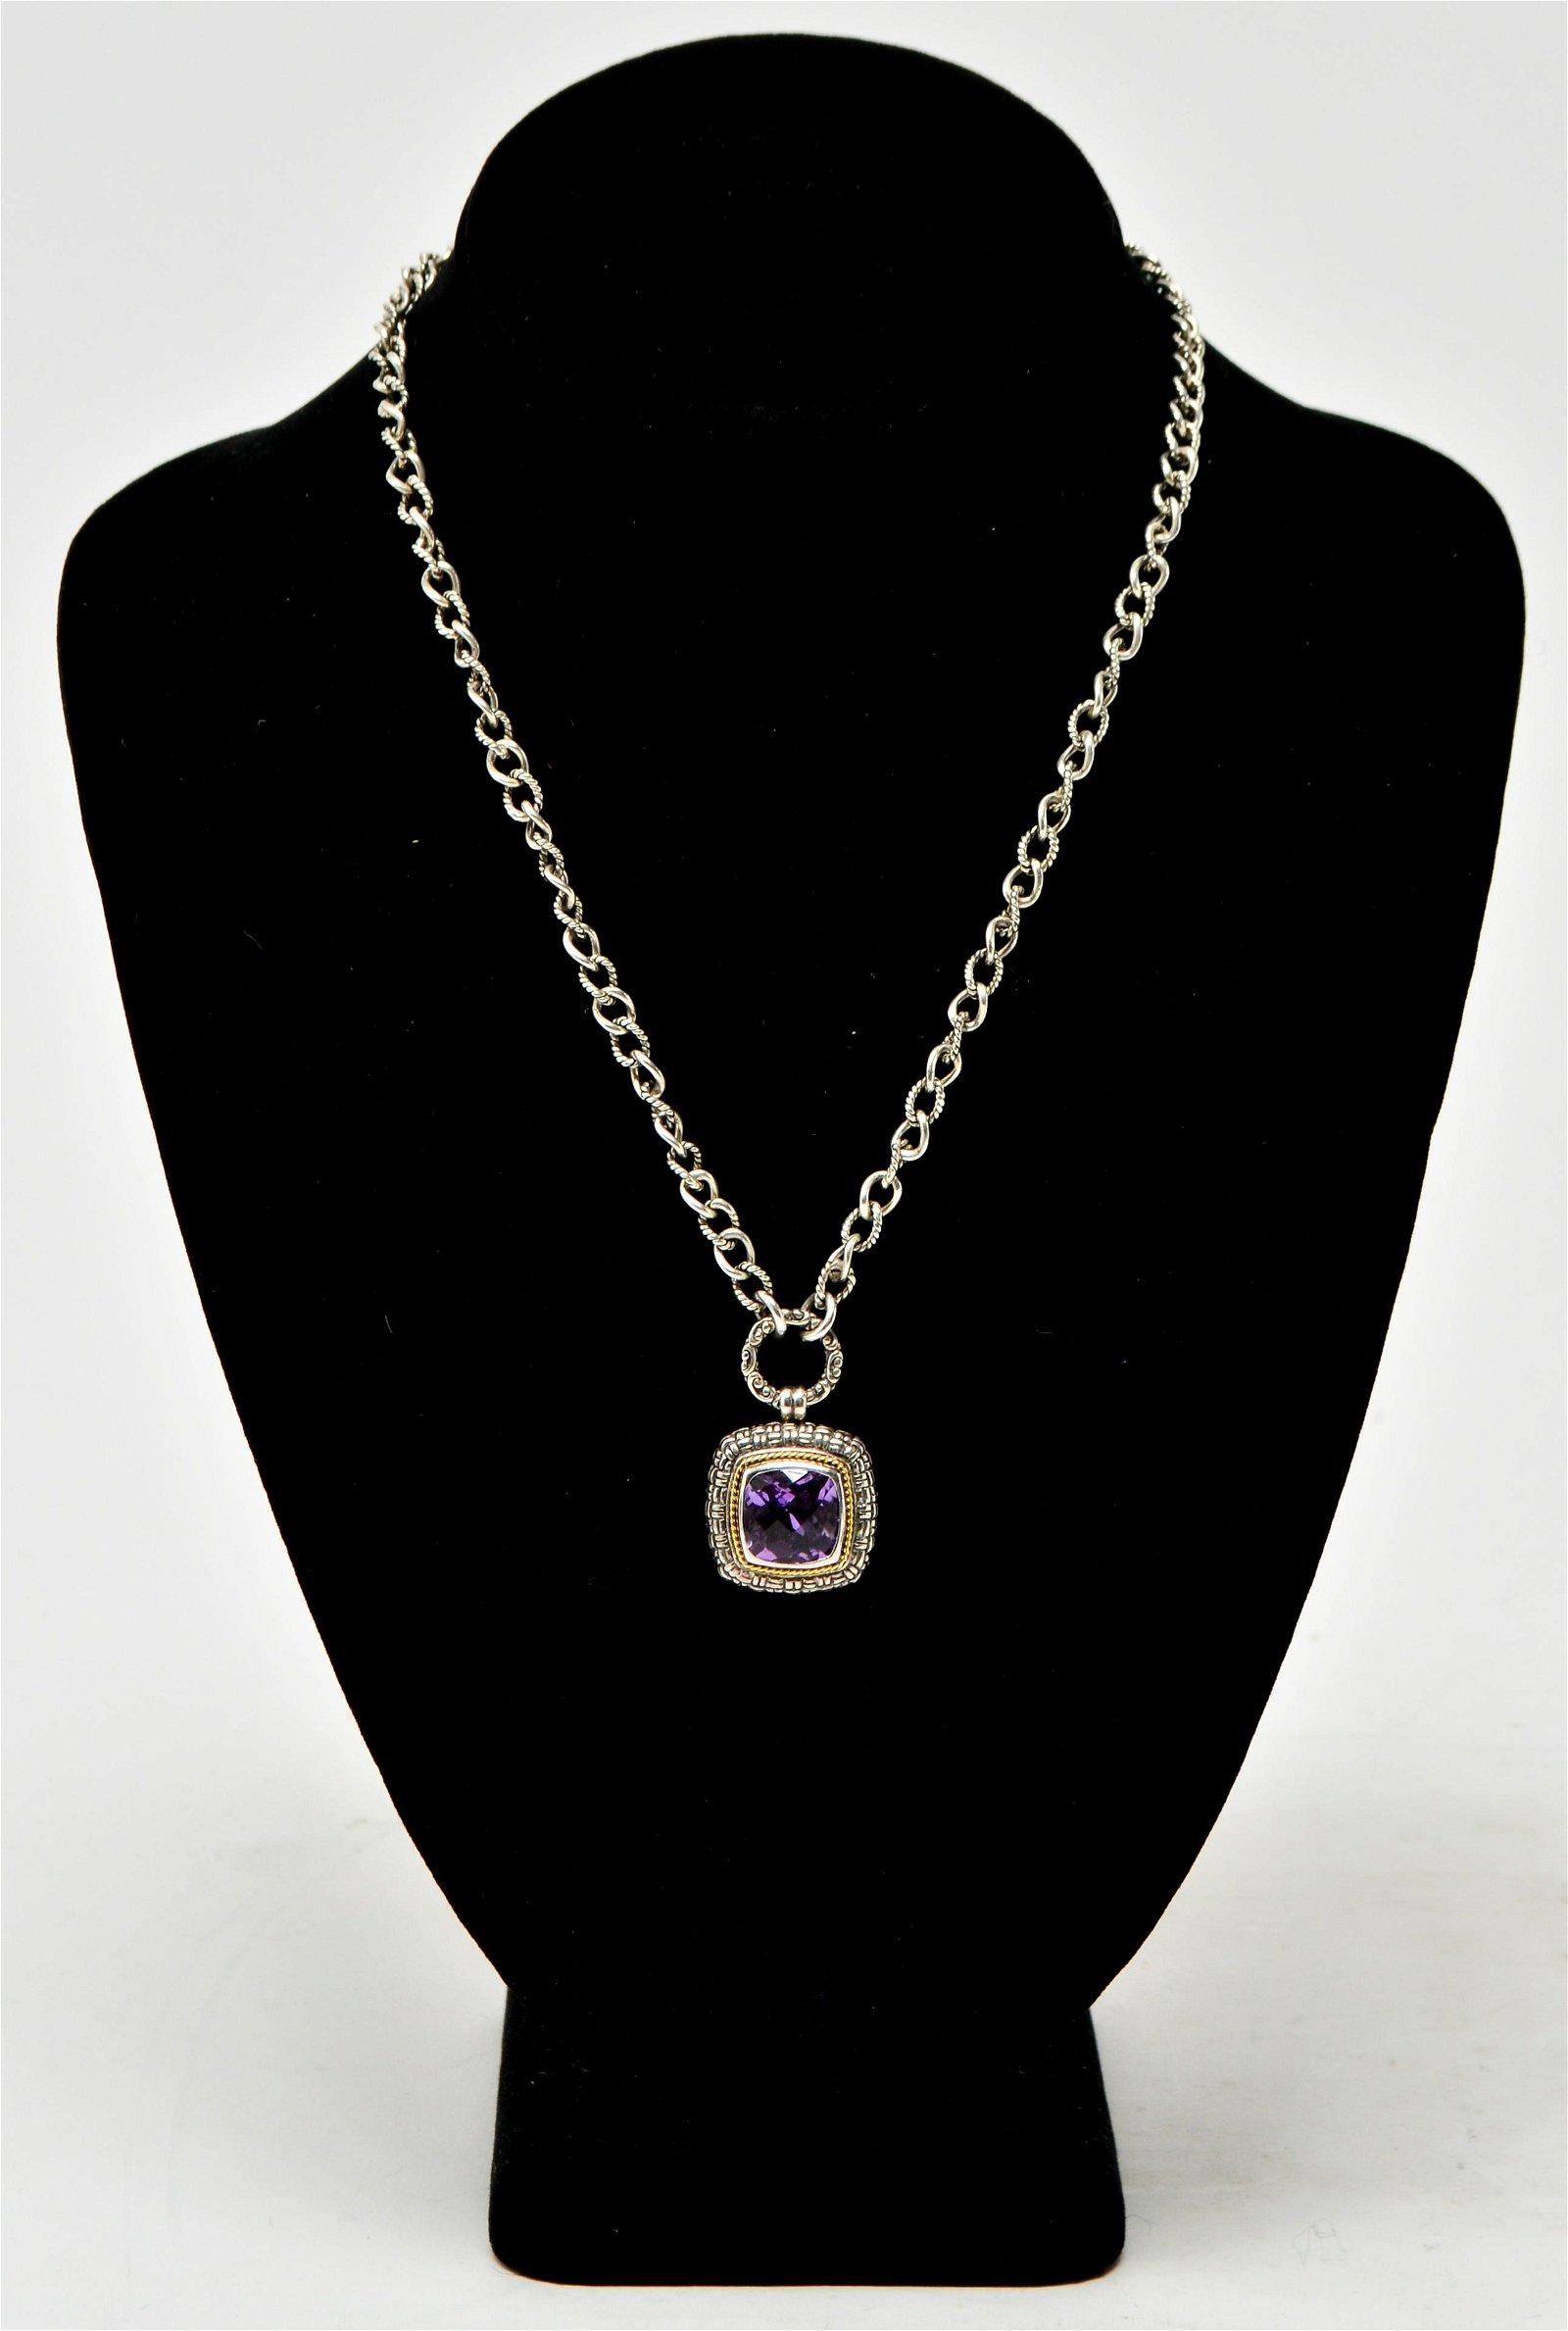 Effy Silver w 18K Gold & Amethyst Pendant Necklace